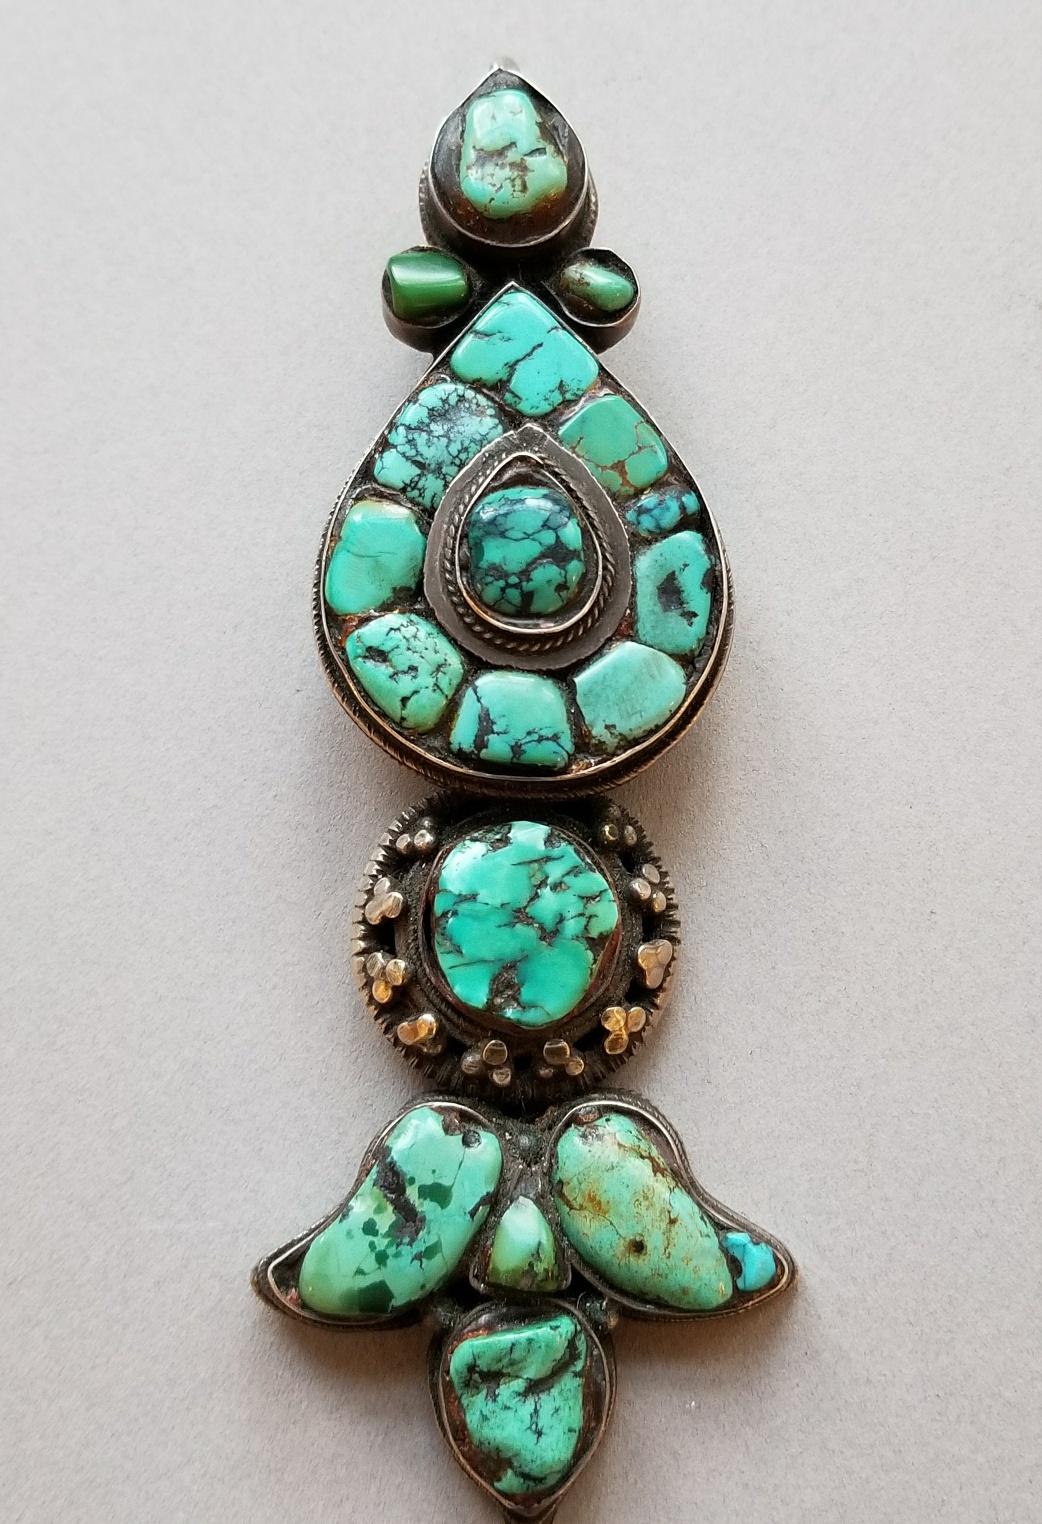 Tibetan turquoise hair ornament